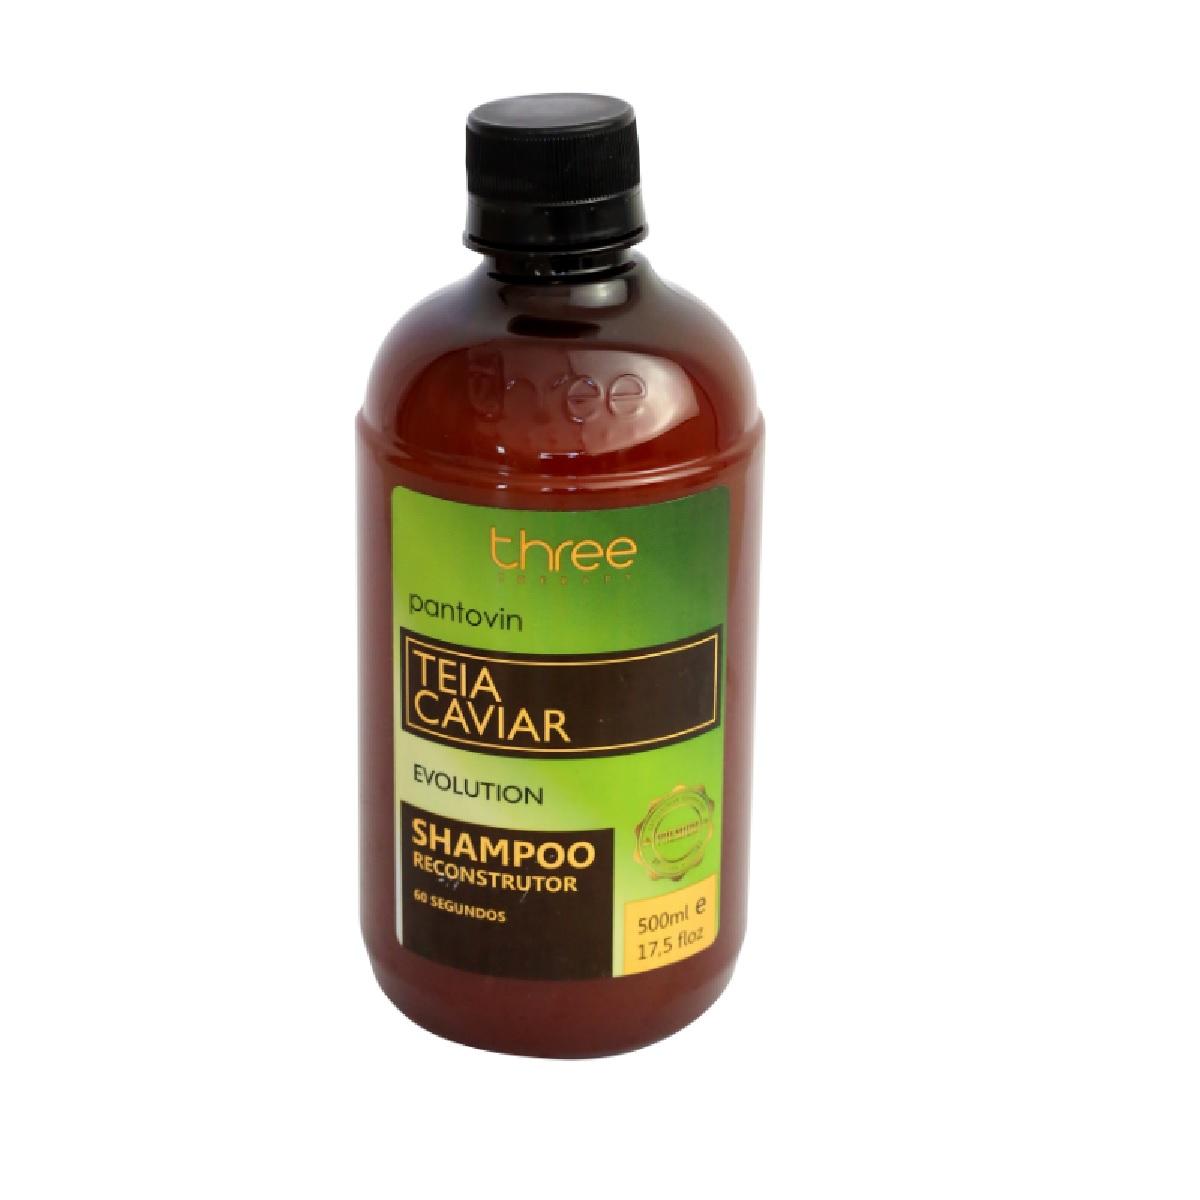 Three Therapy Shampoo Teia Caviar 500ml